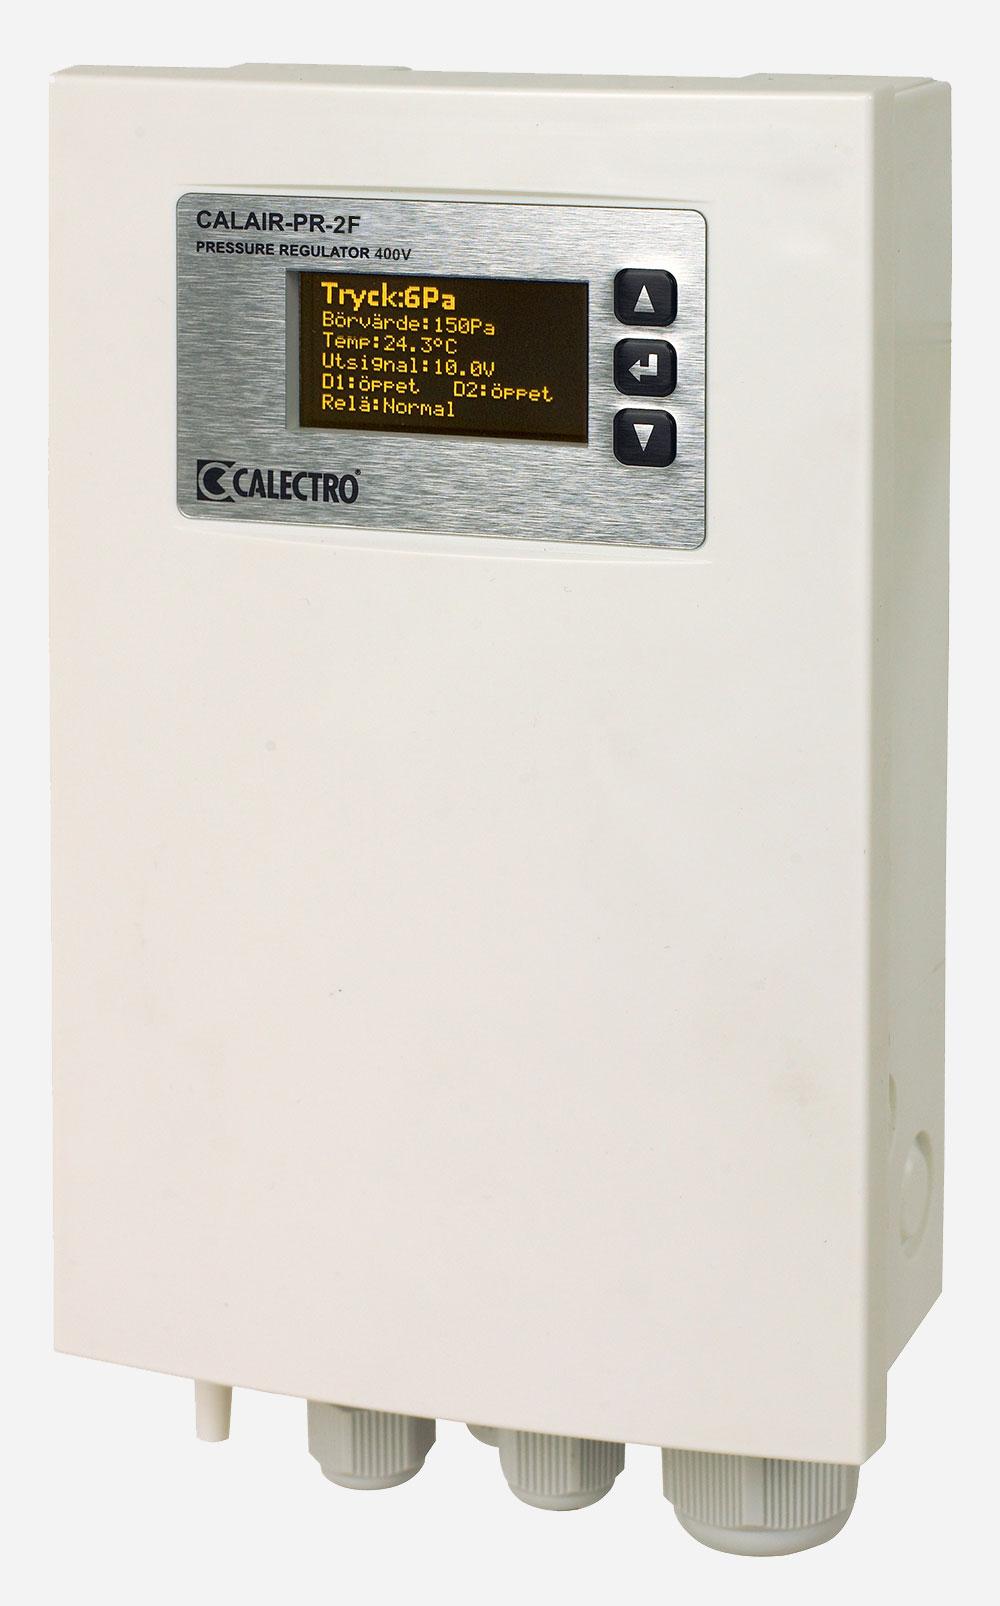 CALAIR-PR-2F